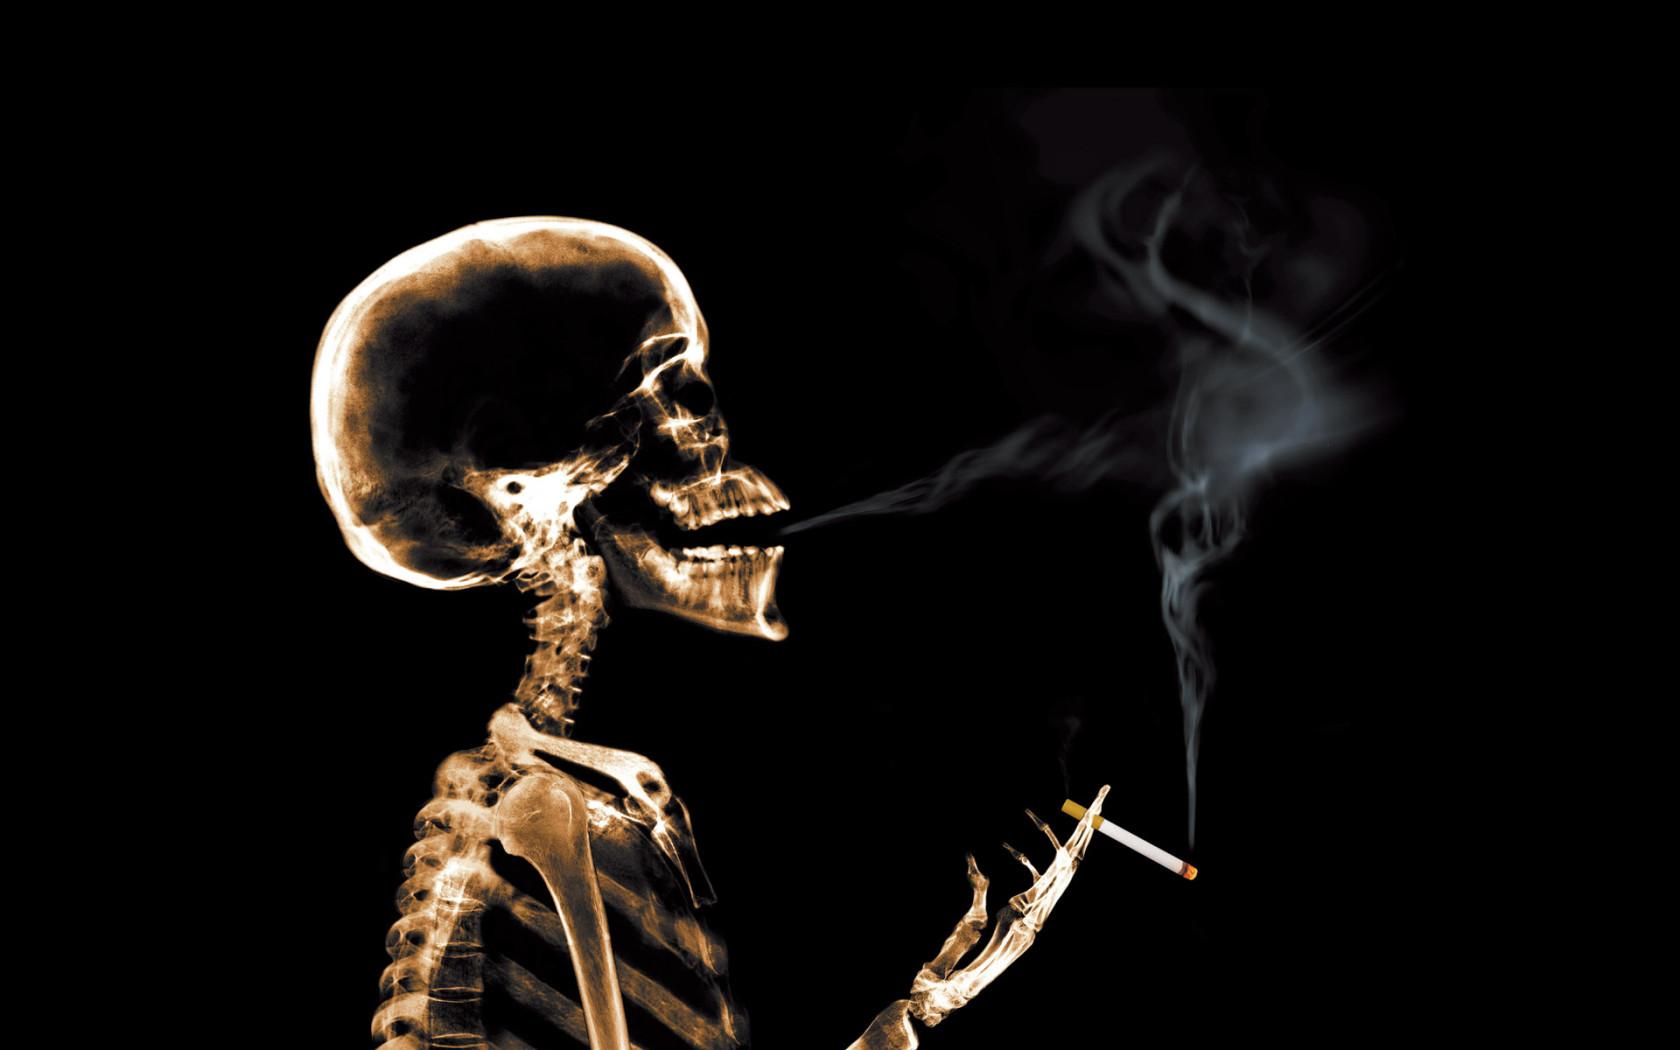 No Smoking Desktop wallpapers 1680x1050 1680x1050